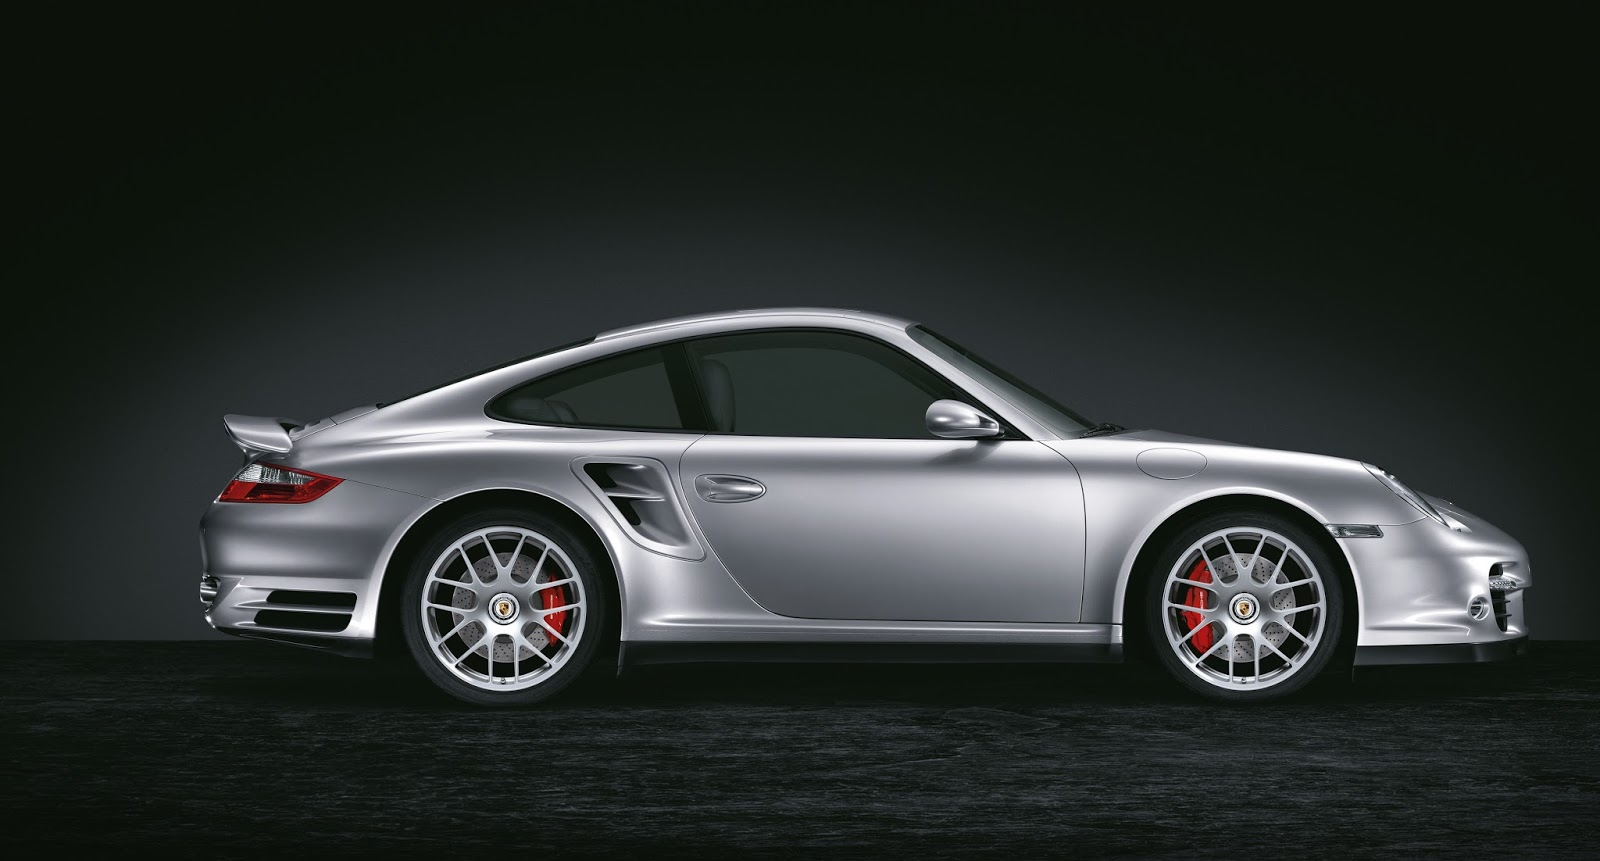 2006 porsche 911 turbo 997 motorstars. Black Bedroom Furniture Sets. Home Design Ideas